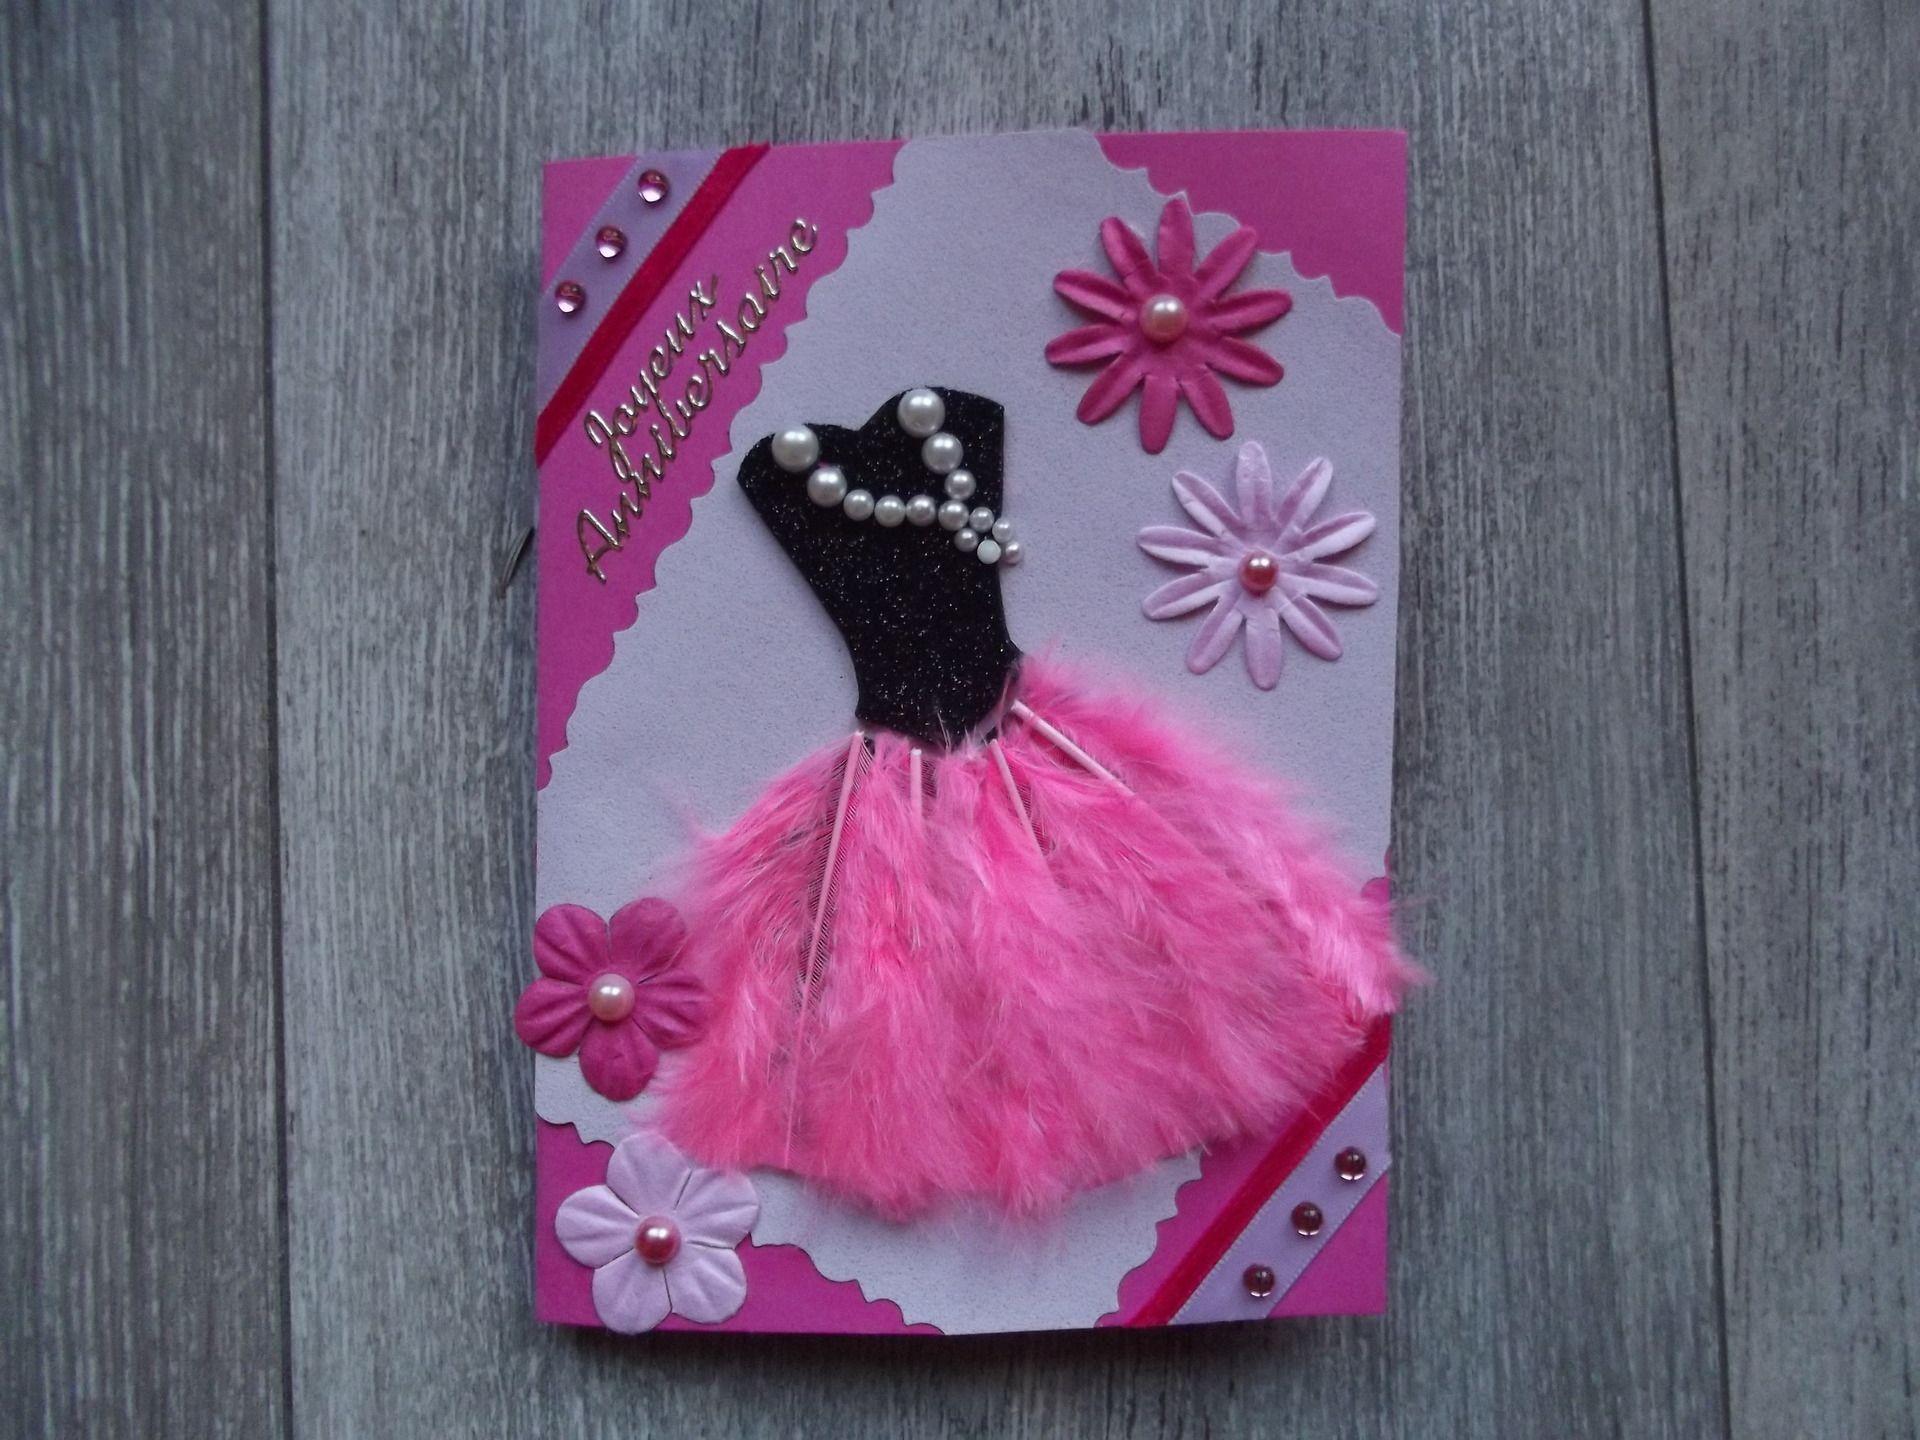 fr carte anniversaire robe a plumes rose cartes invitation pinterest plumes roses carte. Black Bedroom Furniture Sets. Home Design Ideas